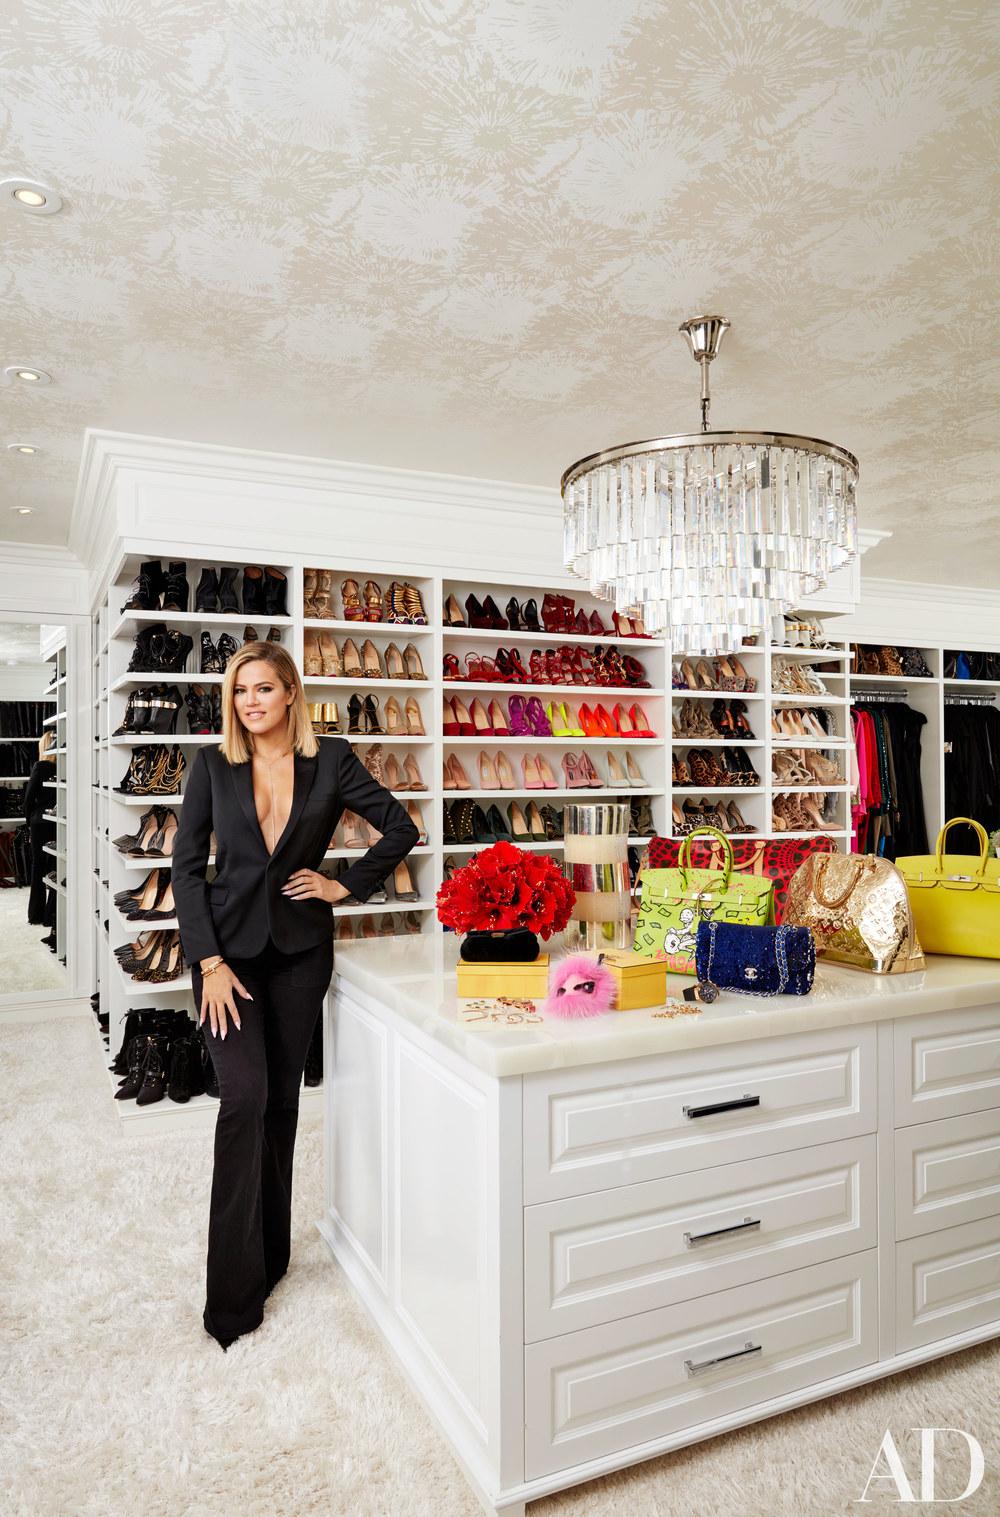 Khloe's Master Closet